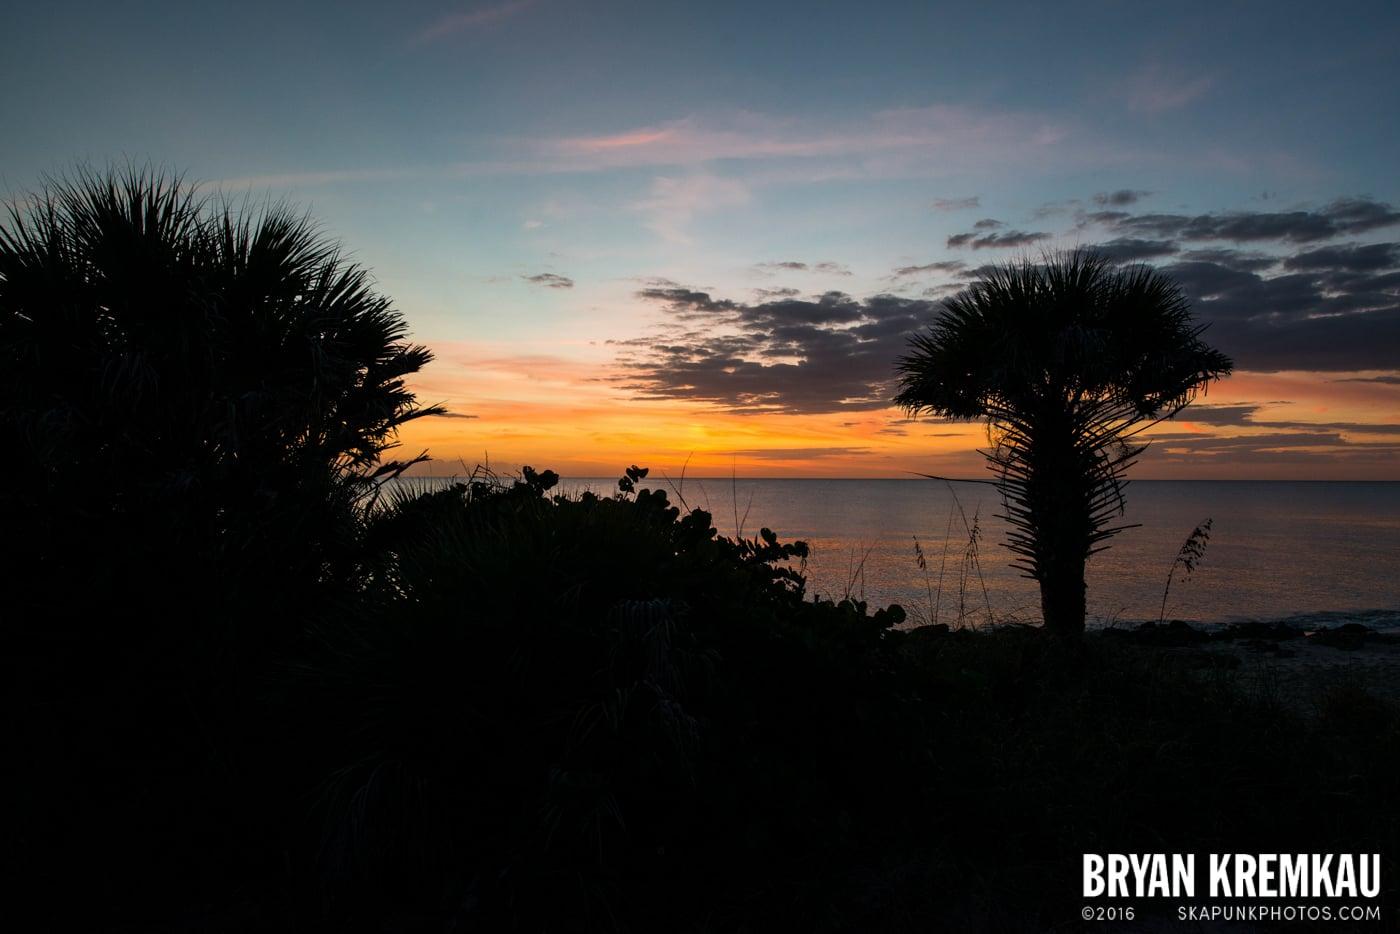 Sunsets, Astrophotography & Birds @ Venice, Florida - 10.25.14 - 11.5.14 (60)